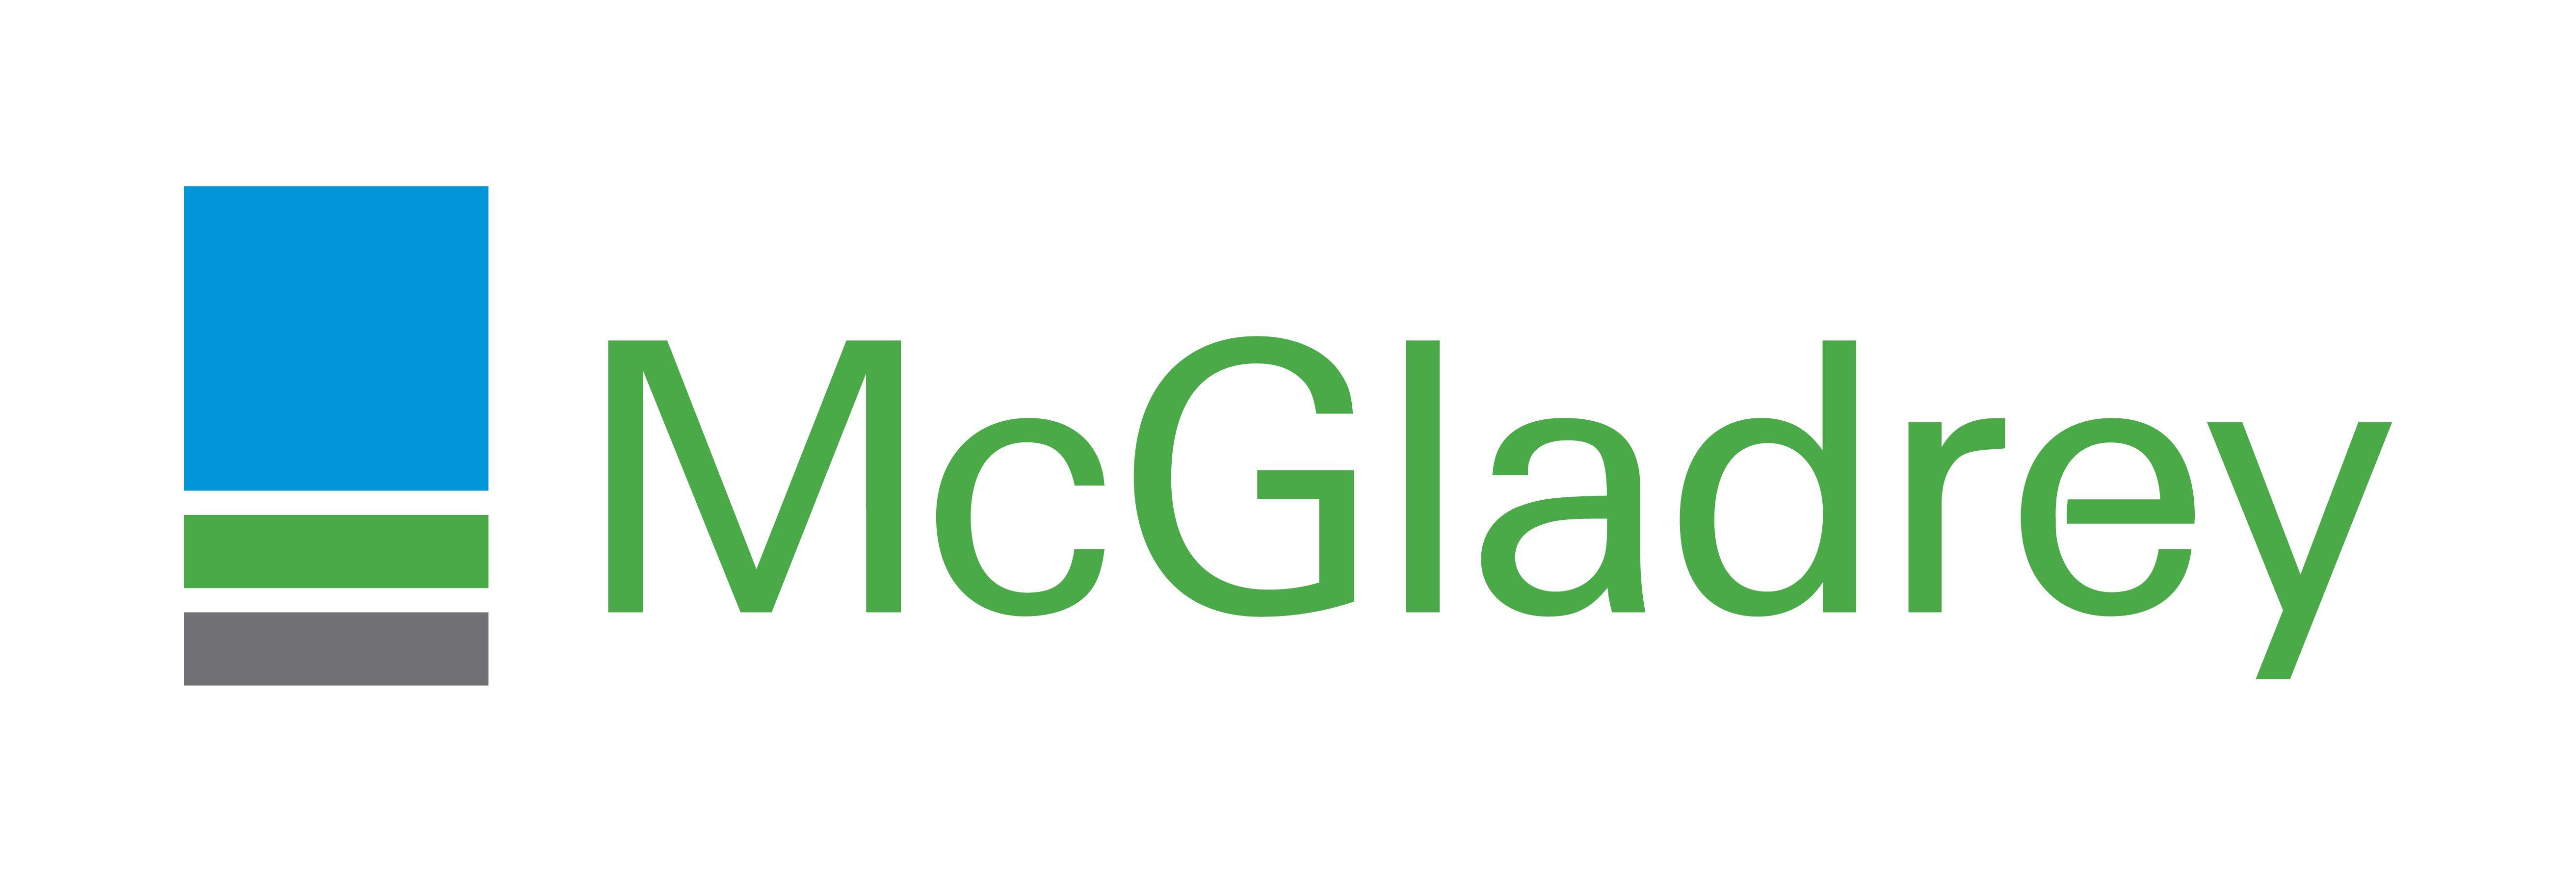 Mcgladrey Classic Logo